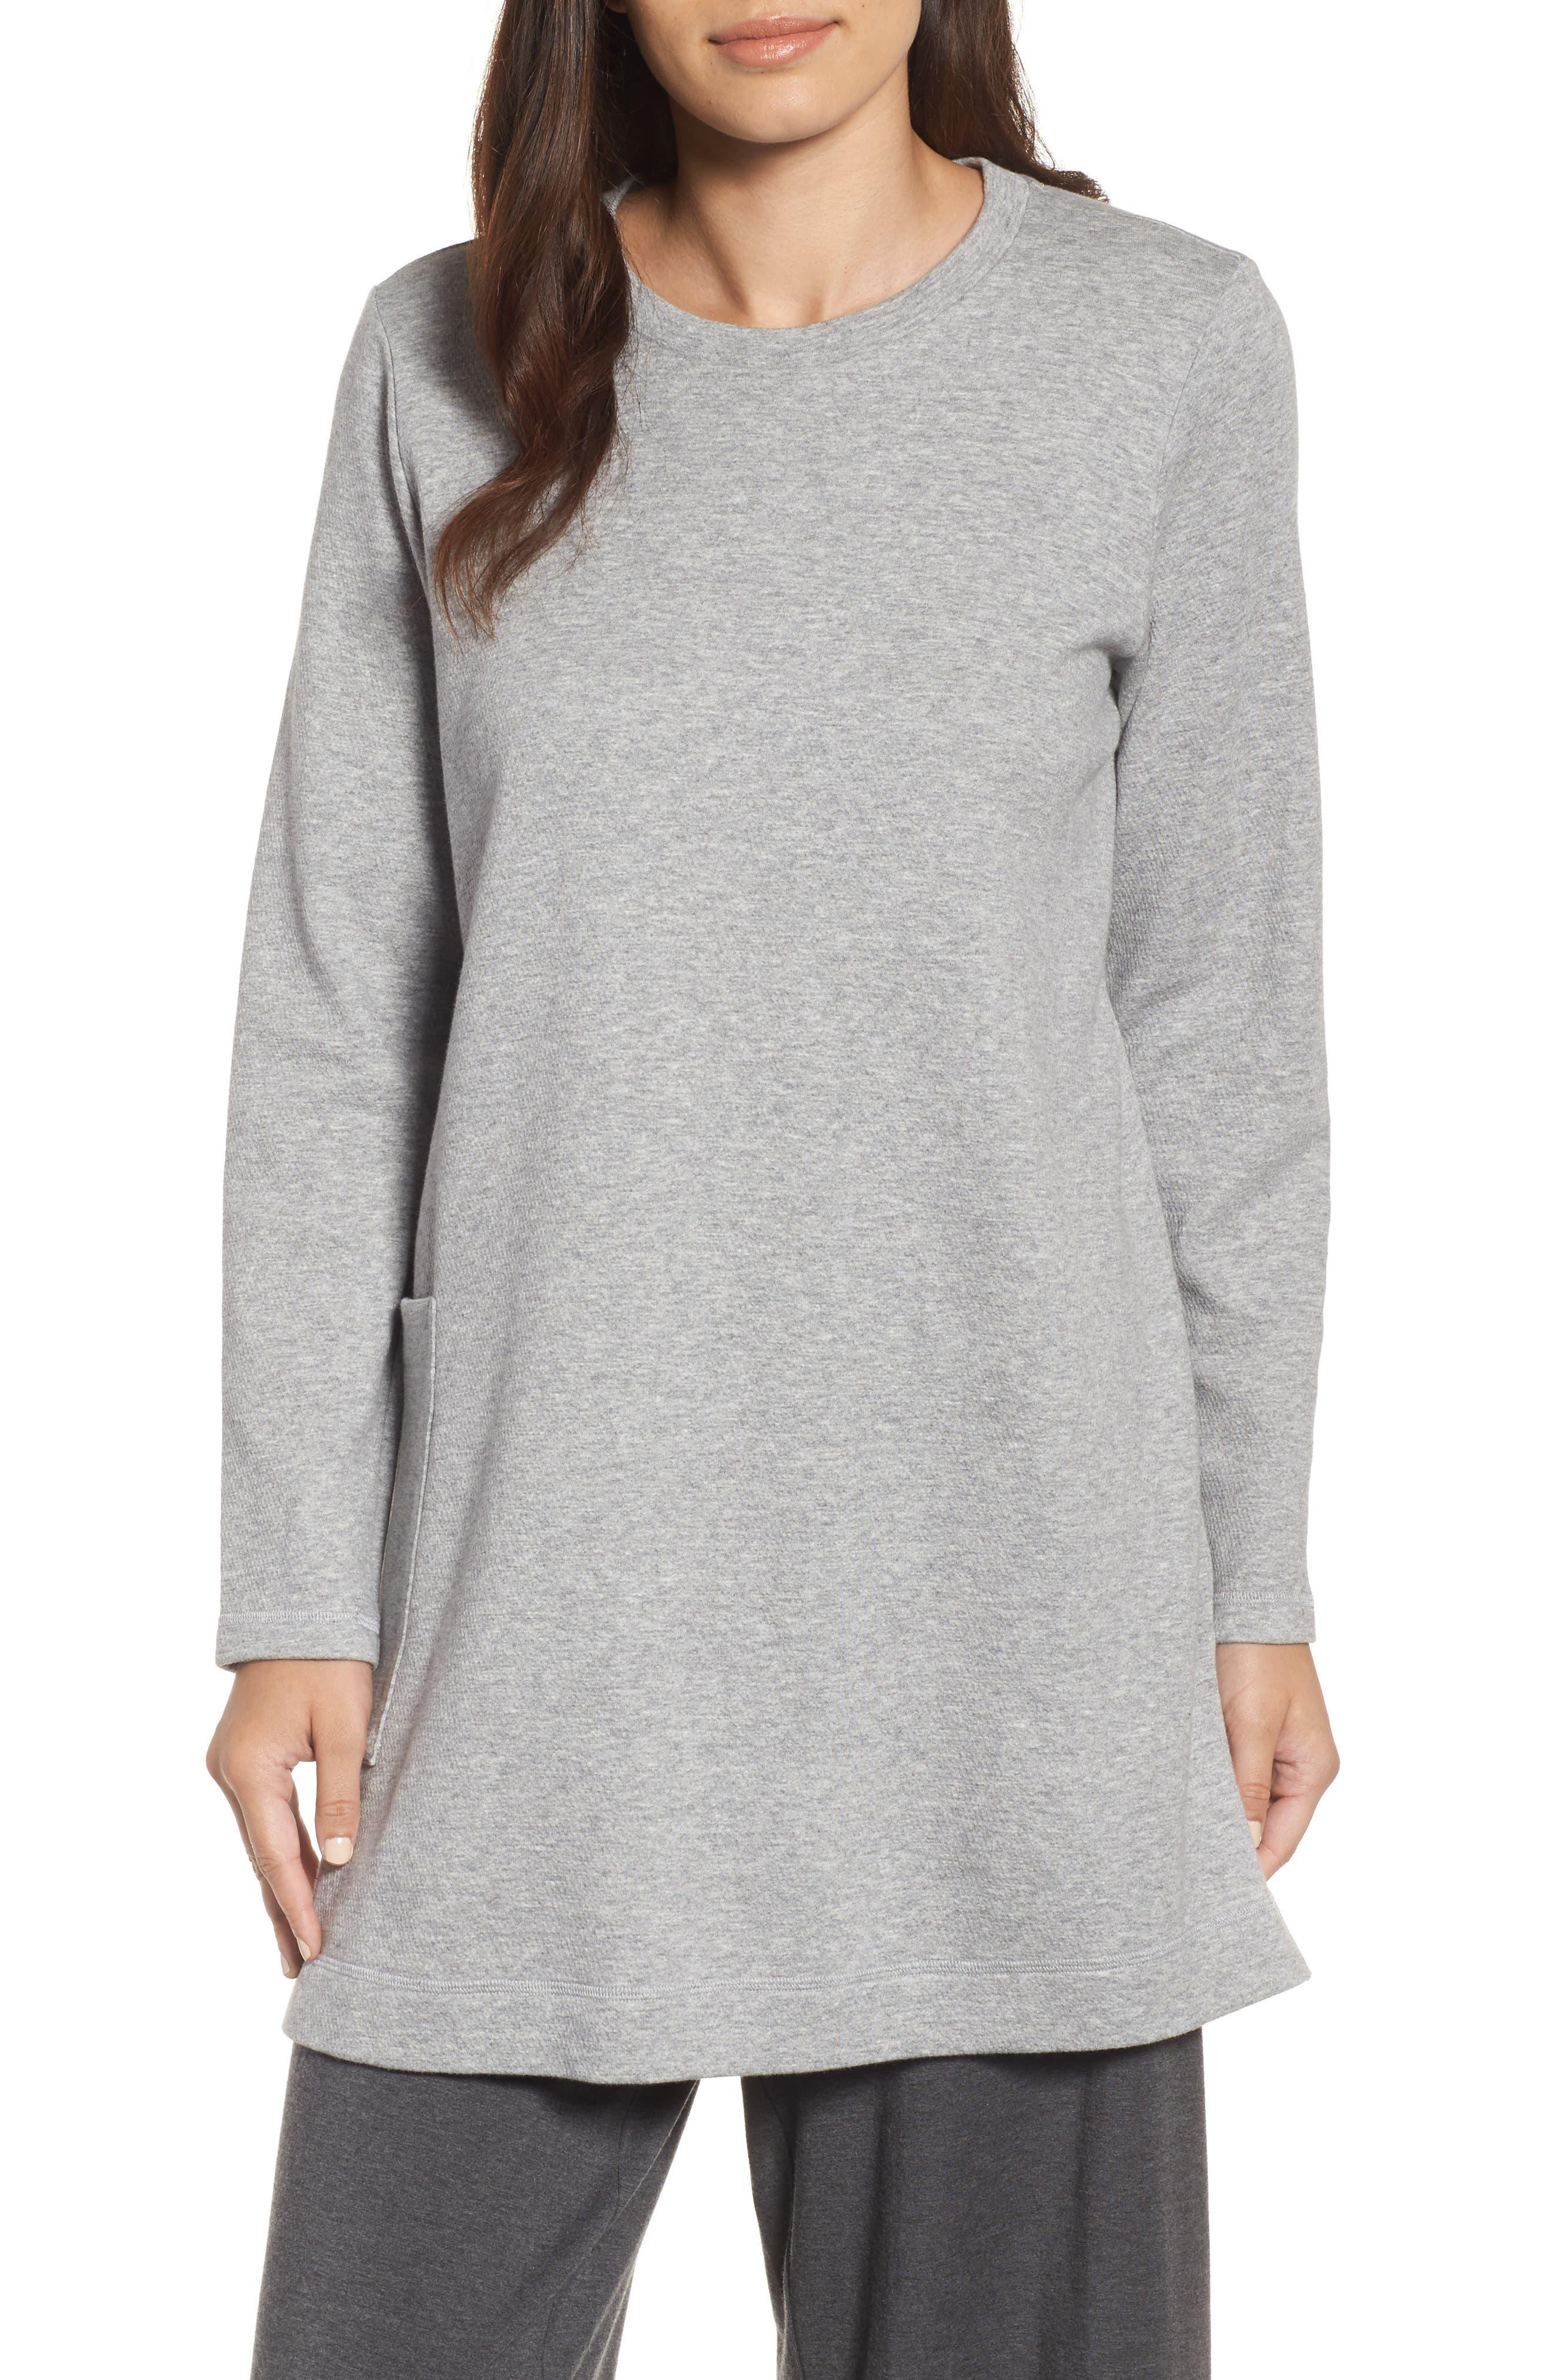 Main Image - Eileen Fisher Double Knit Organic Cotton Tunic